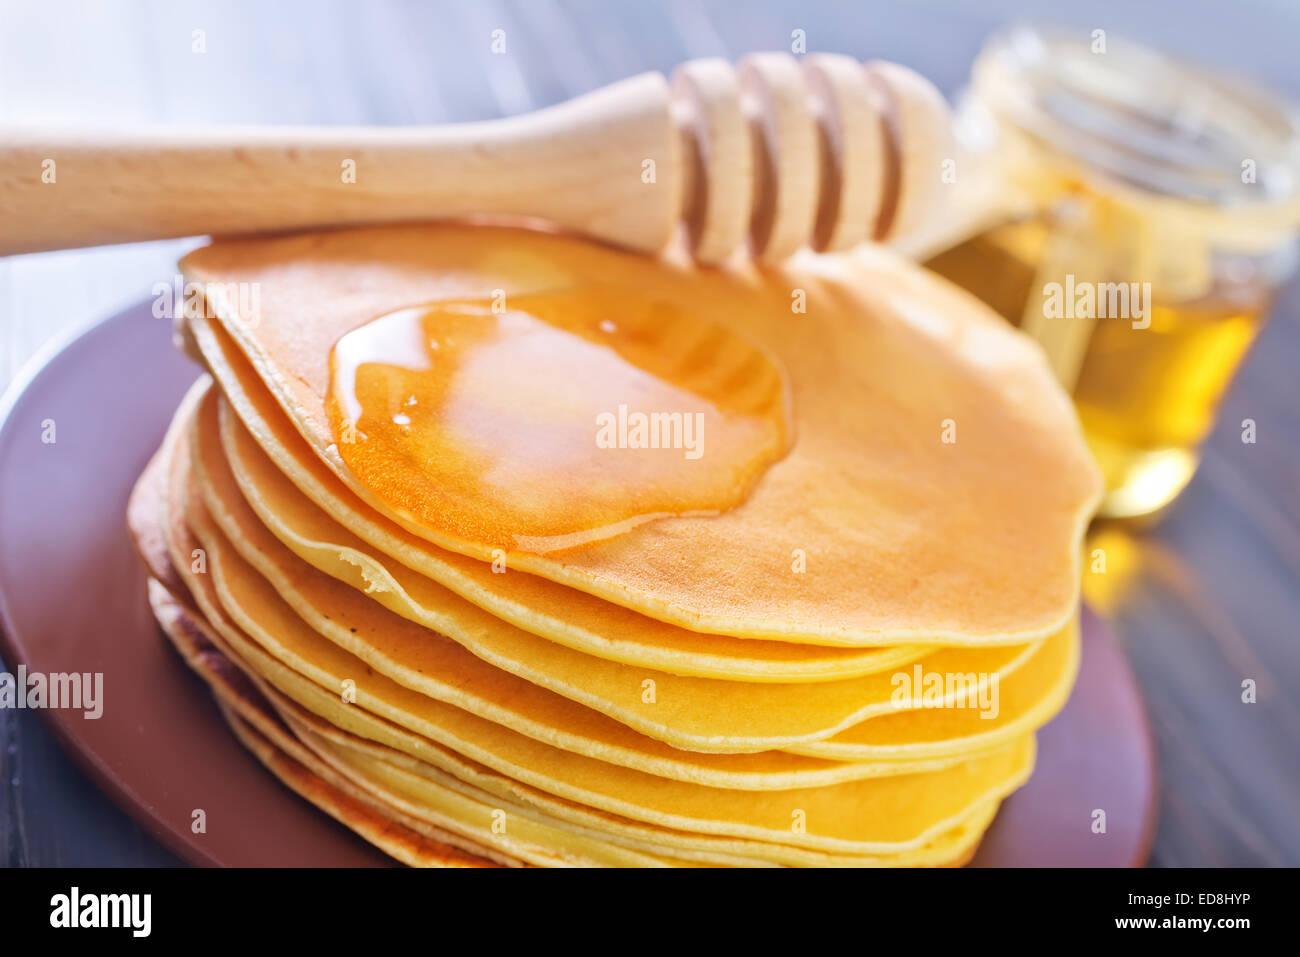 pancakes - Stock Image